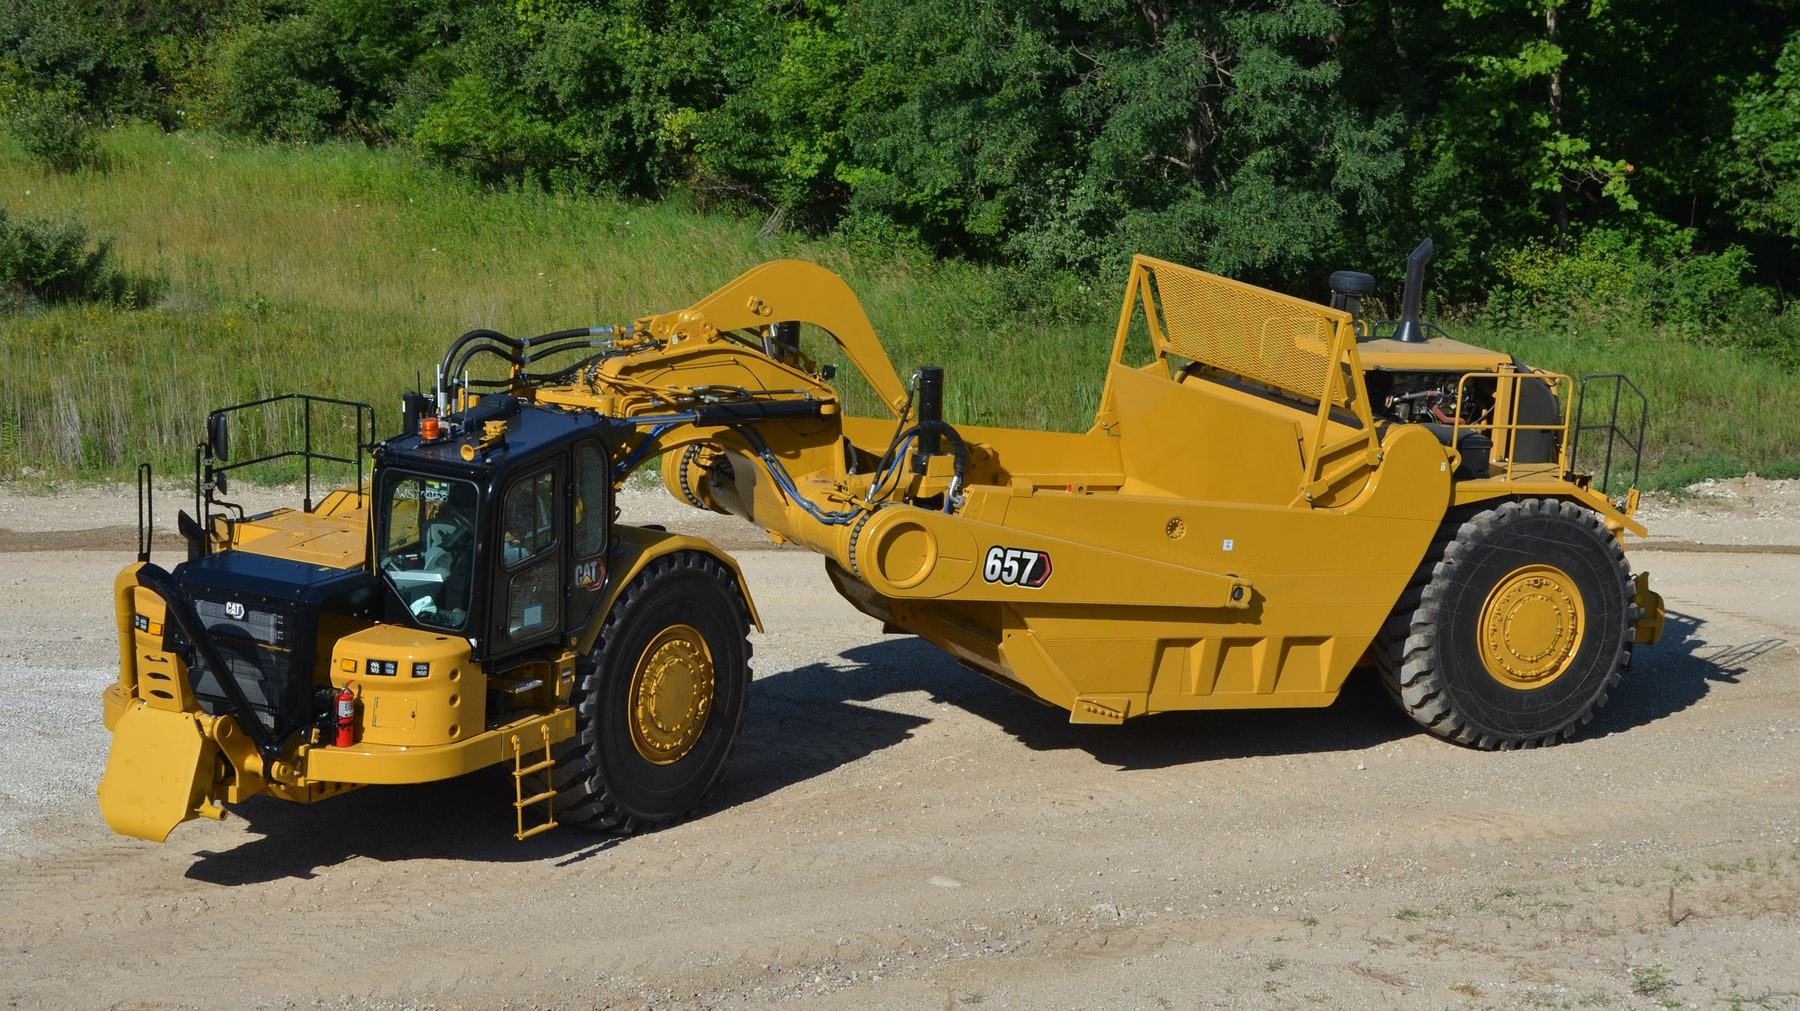 Cat_657_Wheel_Tractor_Scraper____photo_from_high_perspective.5fc918c8934d7.5fc93830c192a.5fc939305b1c1.5fc9393894c96.jpg